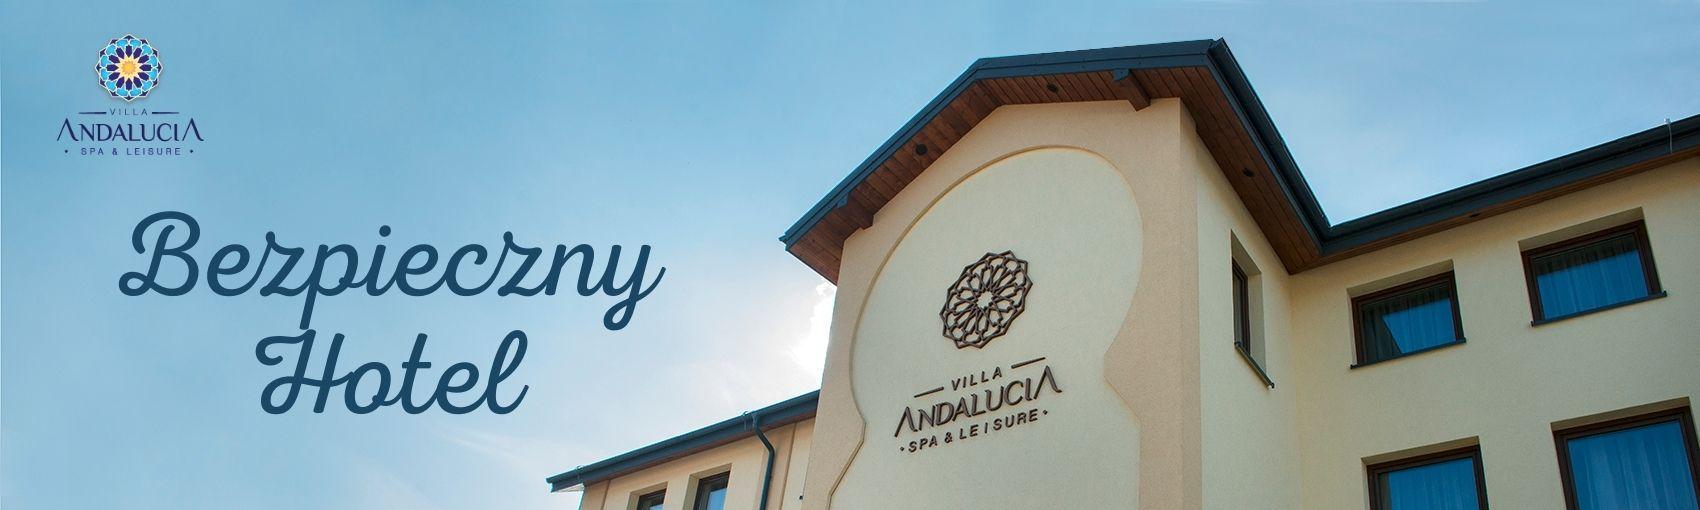 Villa Andalucia - Ciechocinek